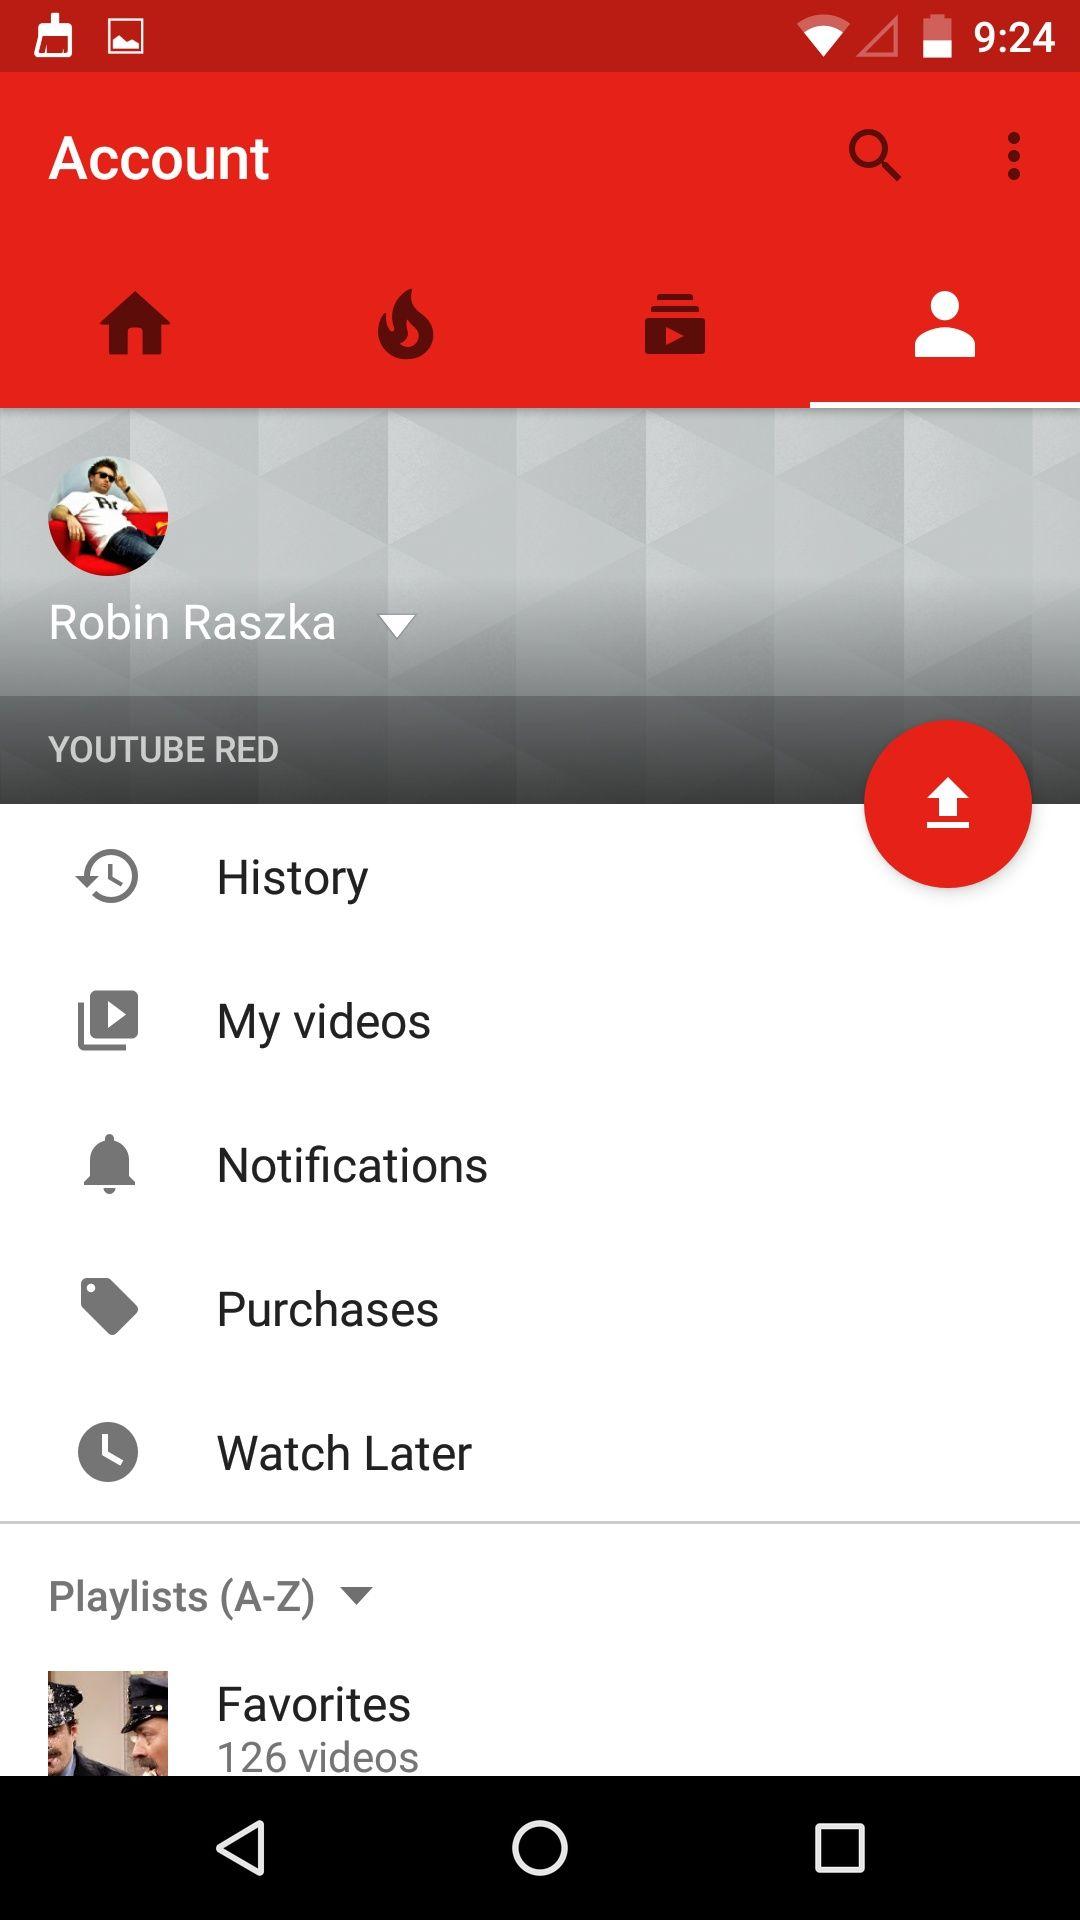 Youtube Design Patterns Pttrns Youtube Design Design Youtube Red